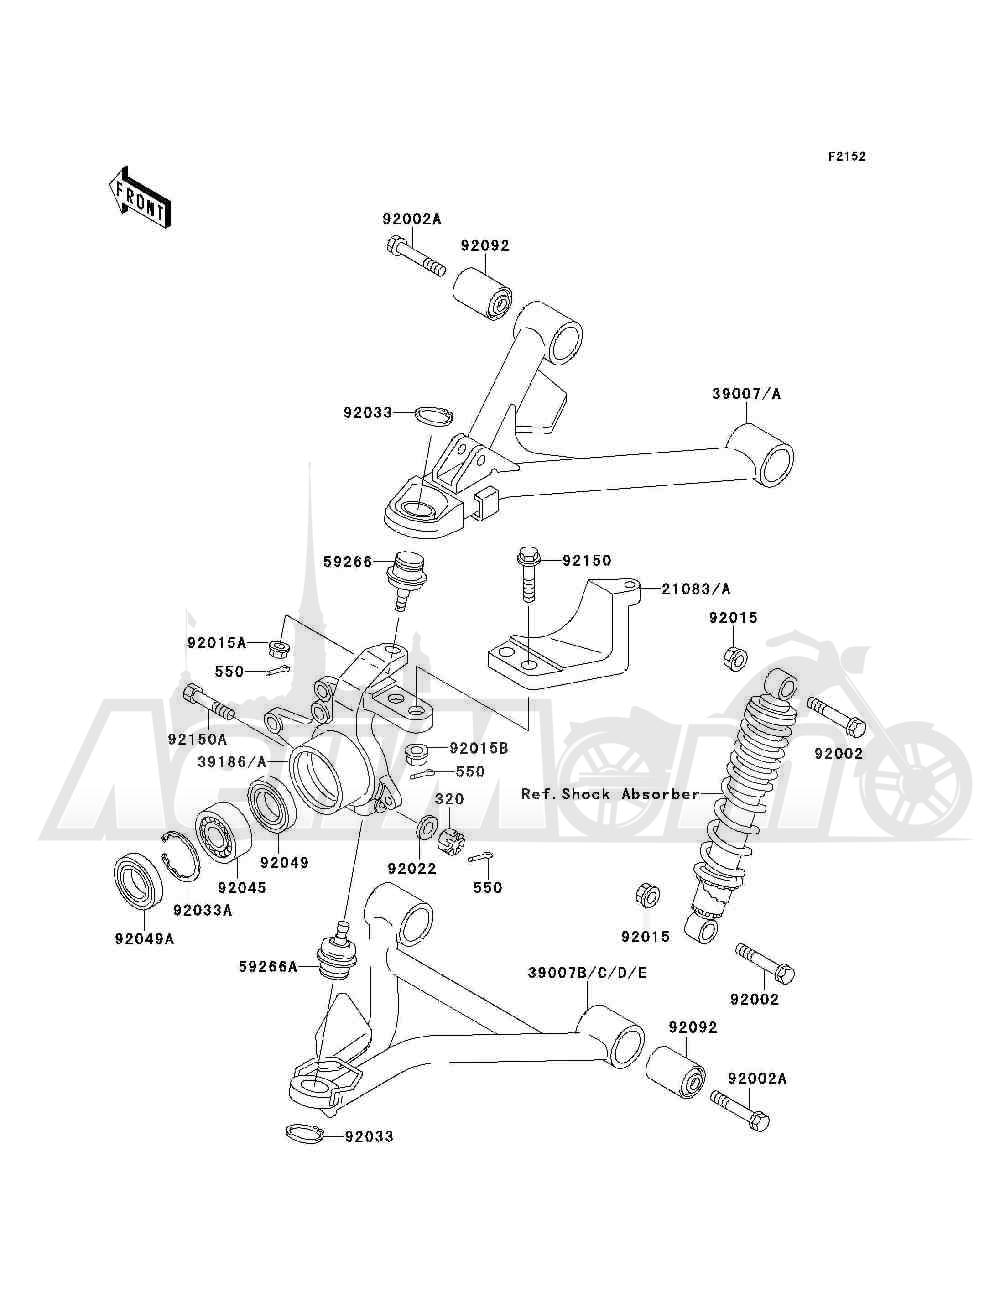 Запчасти для Квадроцикла Kawasaki 1994 BAYOU 300 4X4 (KLF300-C6) Раздел: FRONT SUSPENSION | передняя подвеска